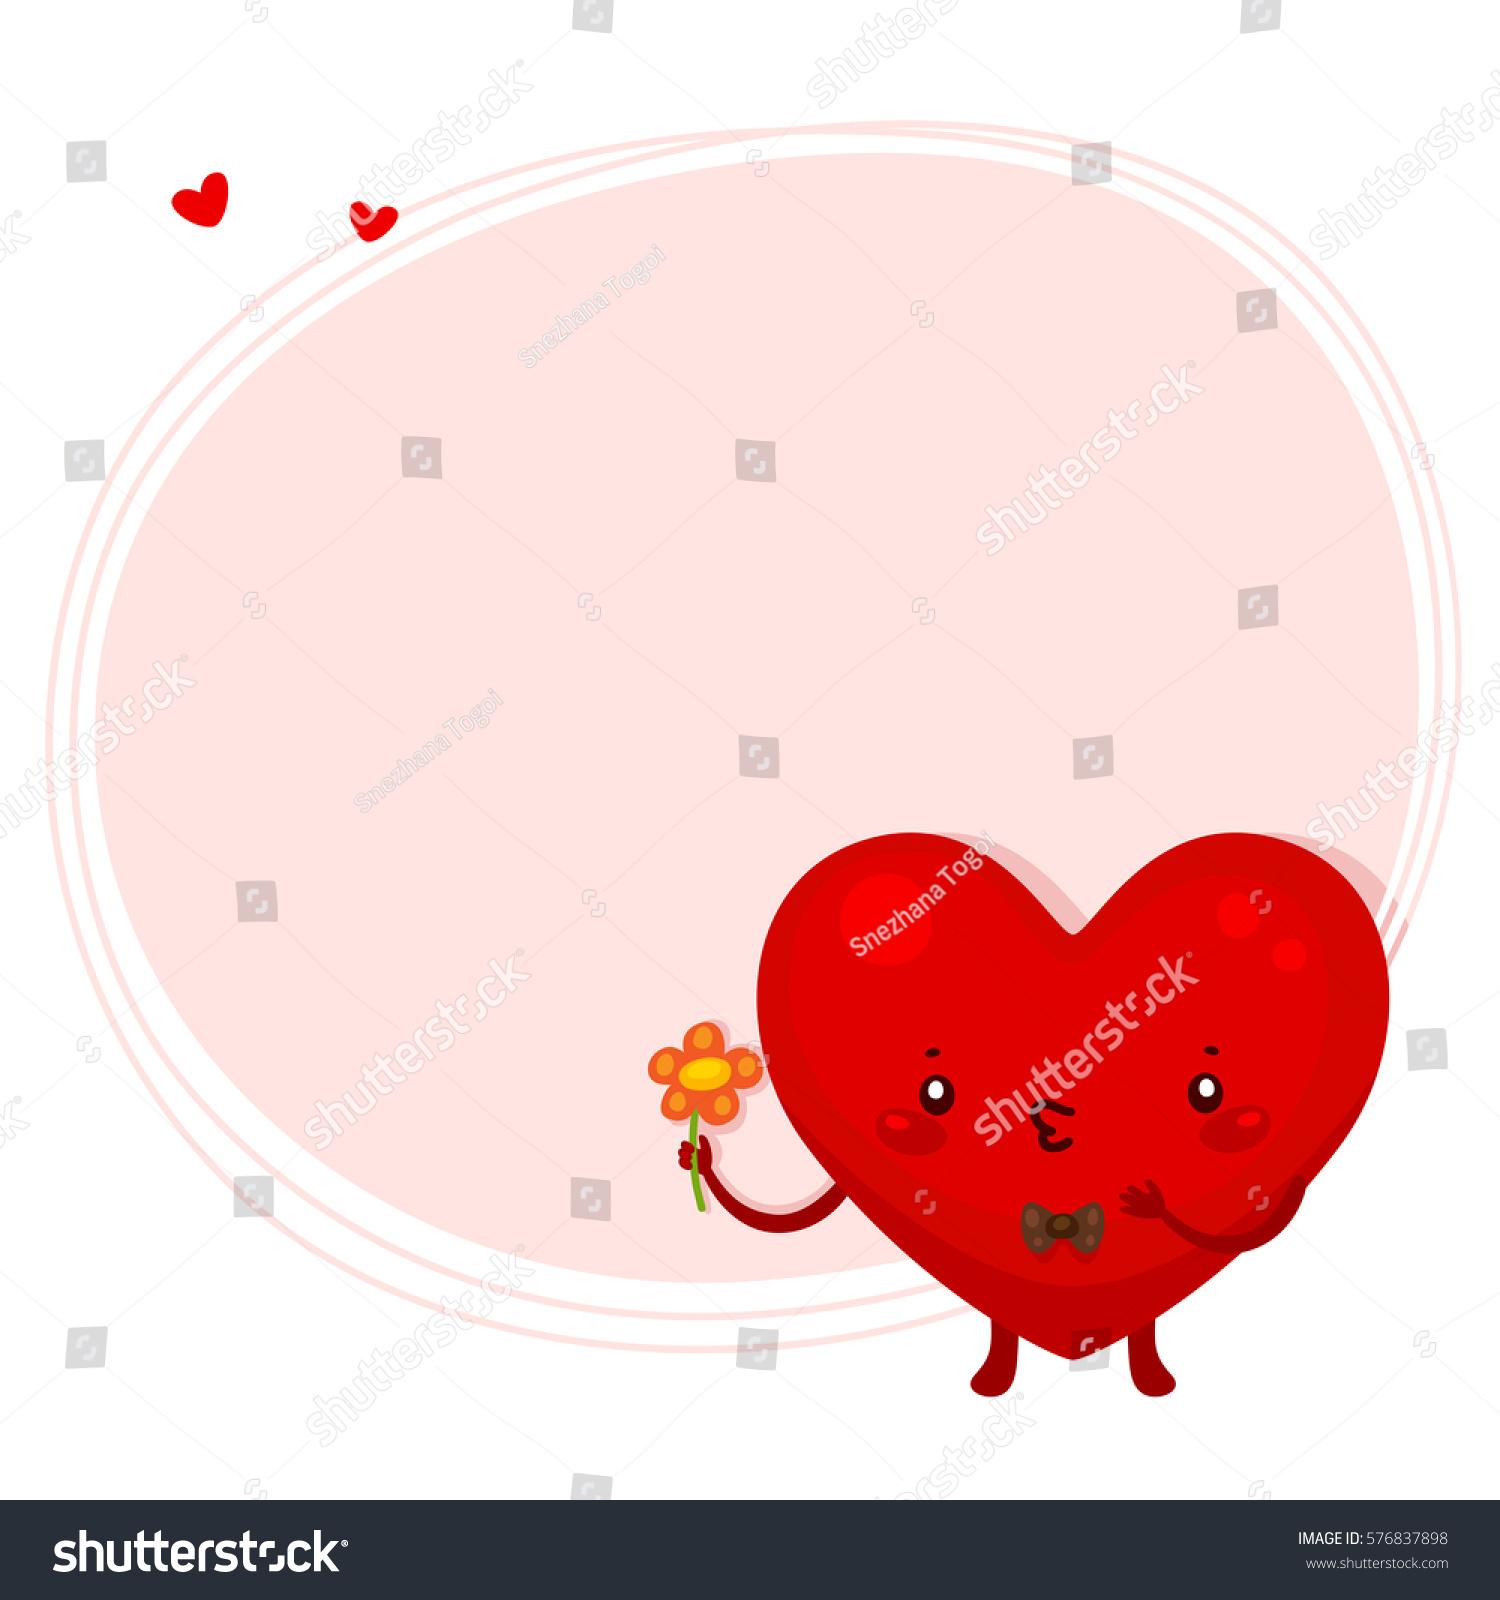 Cute Heart Gentleman Flower Valentine Symbol Stock Vector 576837898